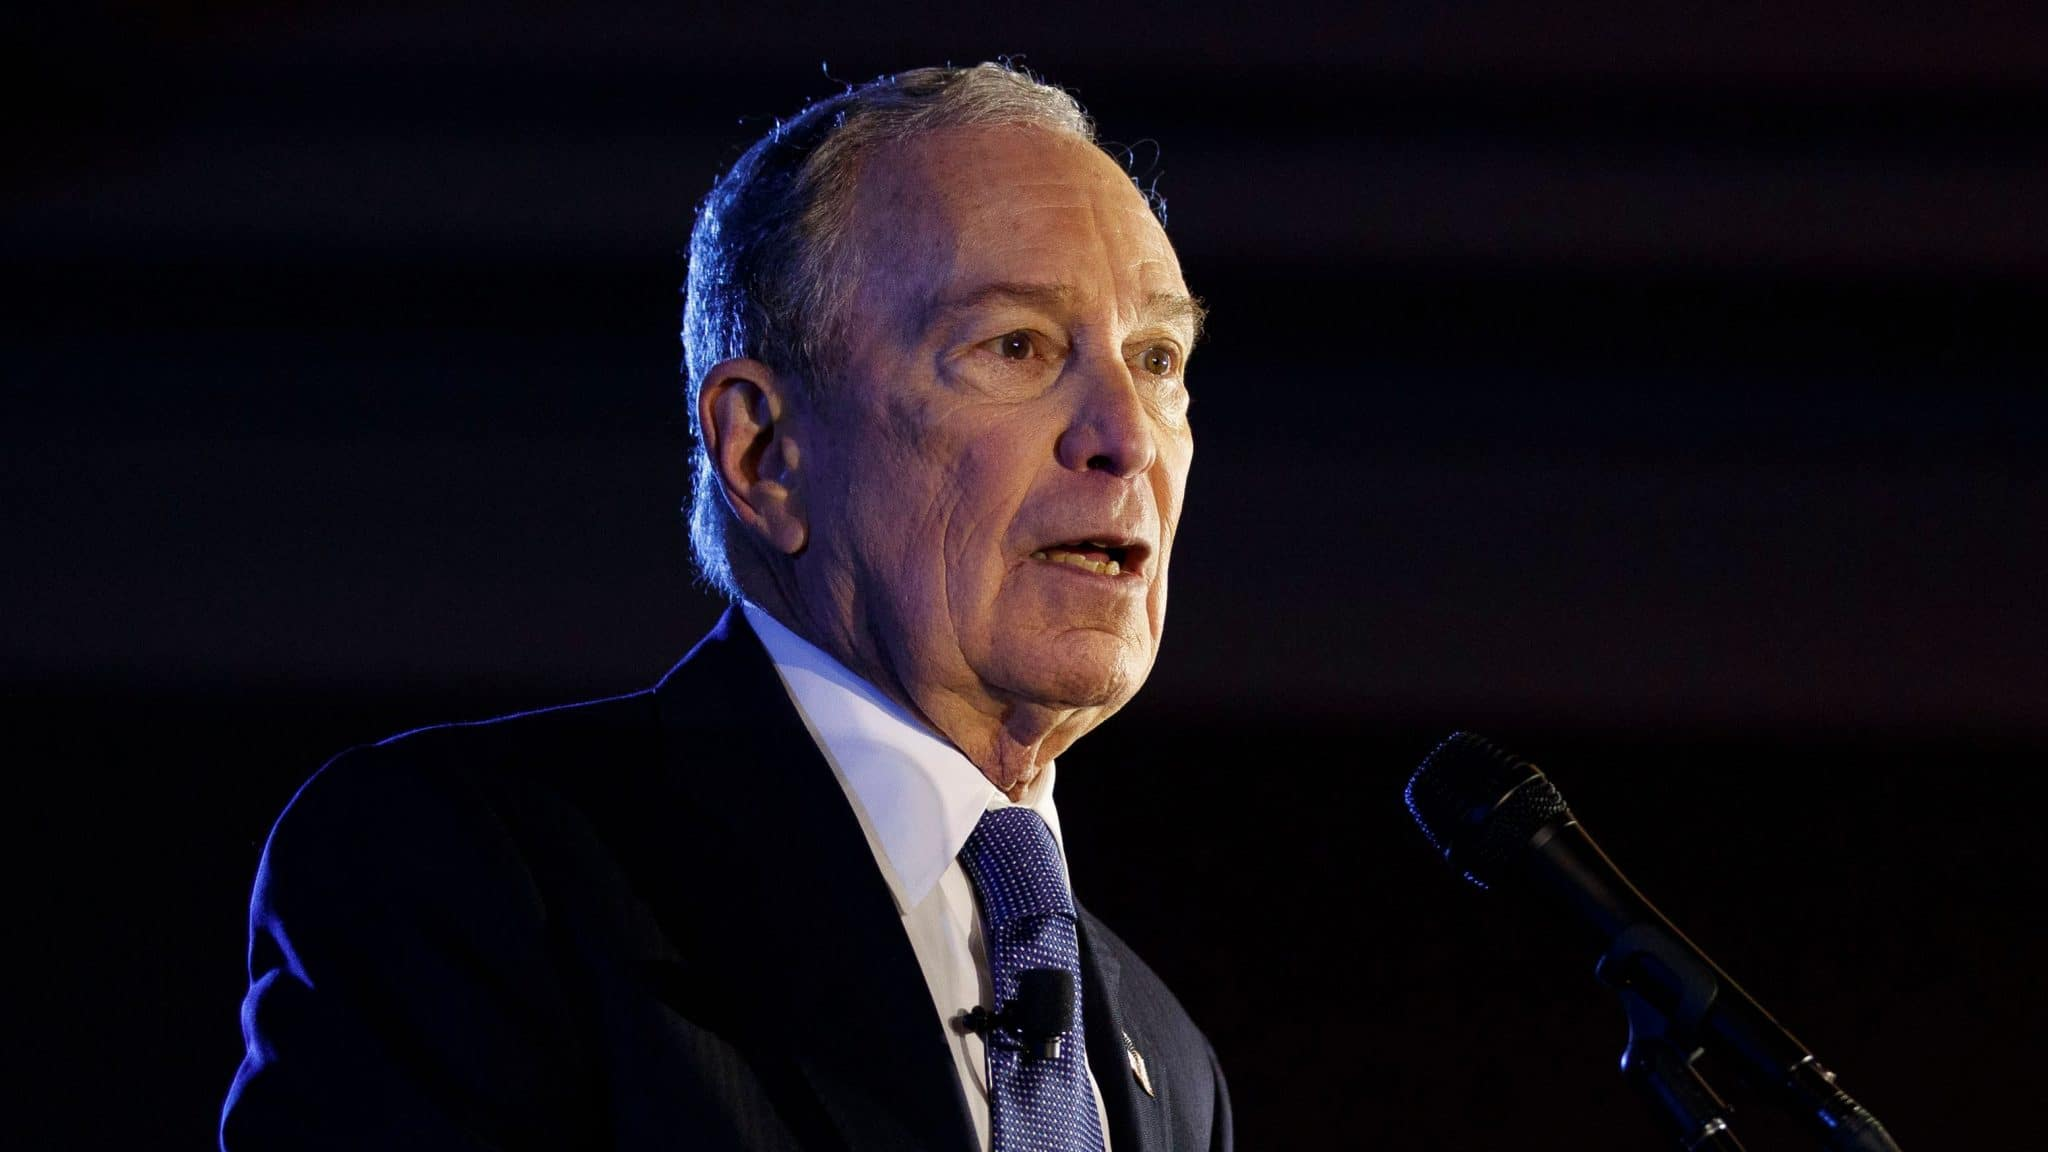 Bloomberg Suspends Presidential Campaign, Endorses Biden